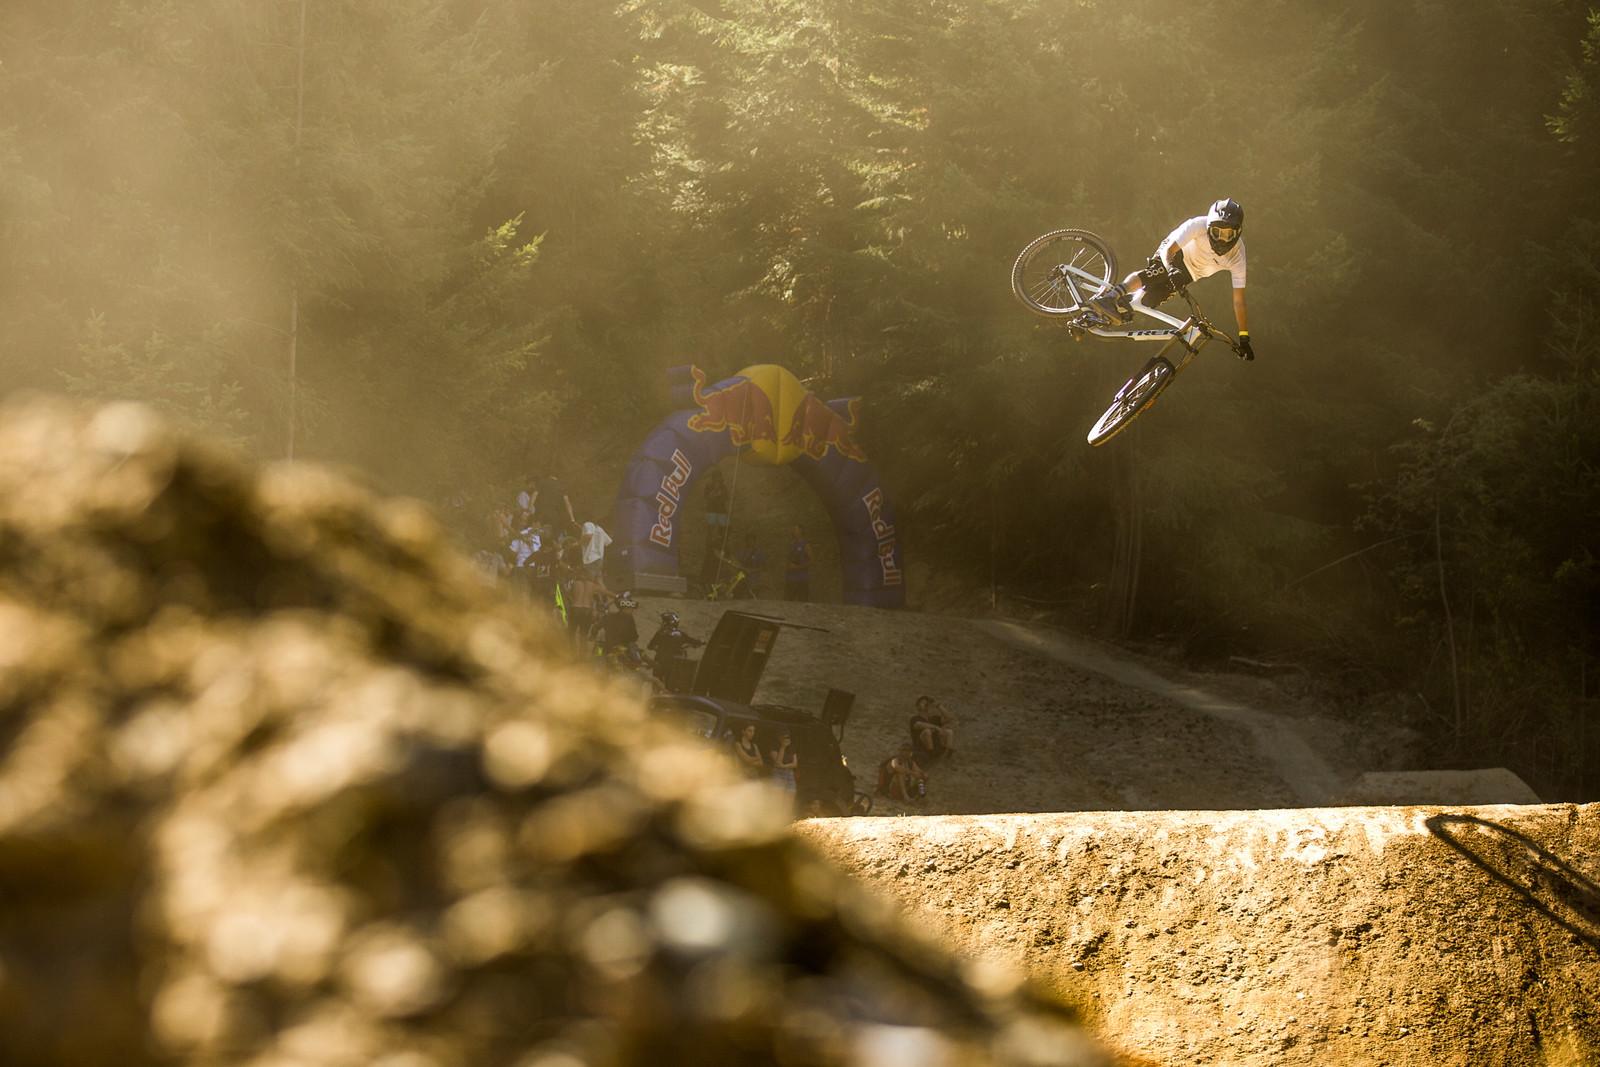 Barney Edwards - McGazza Fest Dream Track Jam - Mountain Biking Pictures - Vital MTB